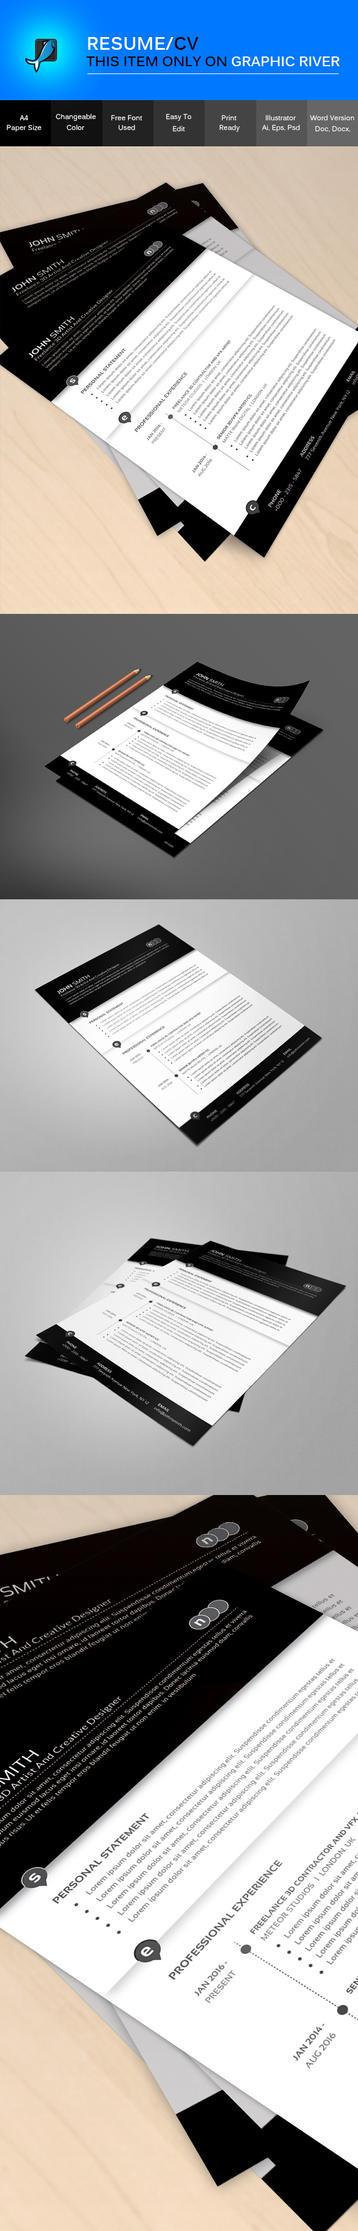 Resume/CV by mdbulbulahmed